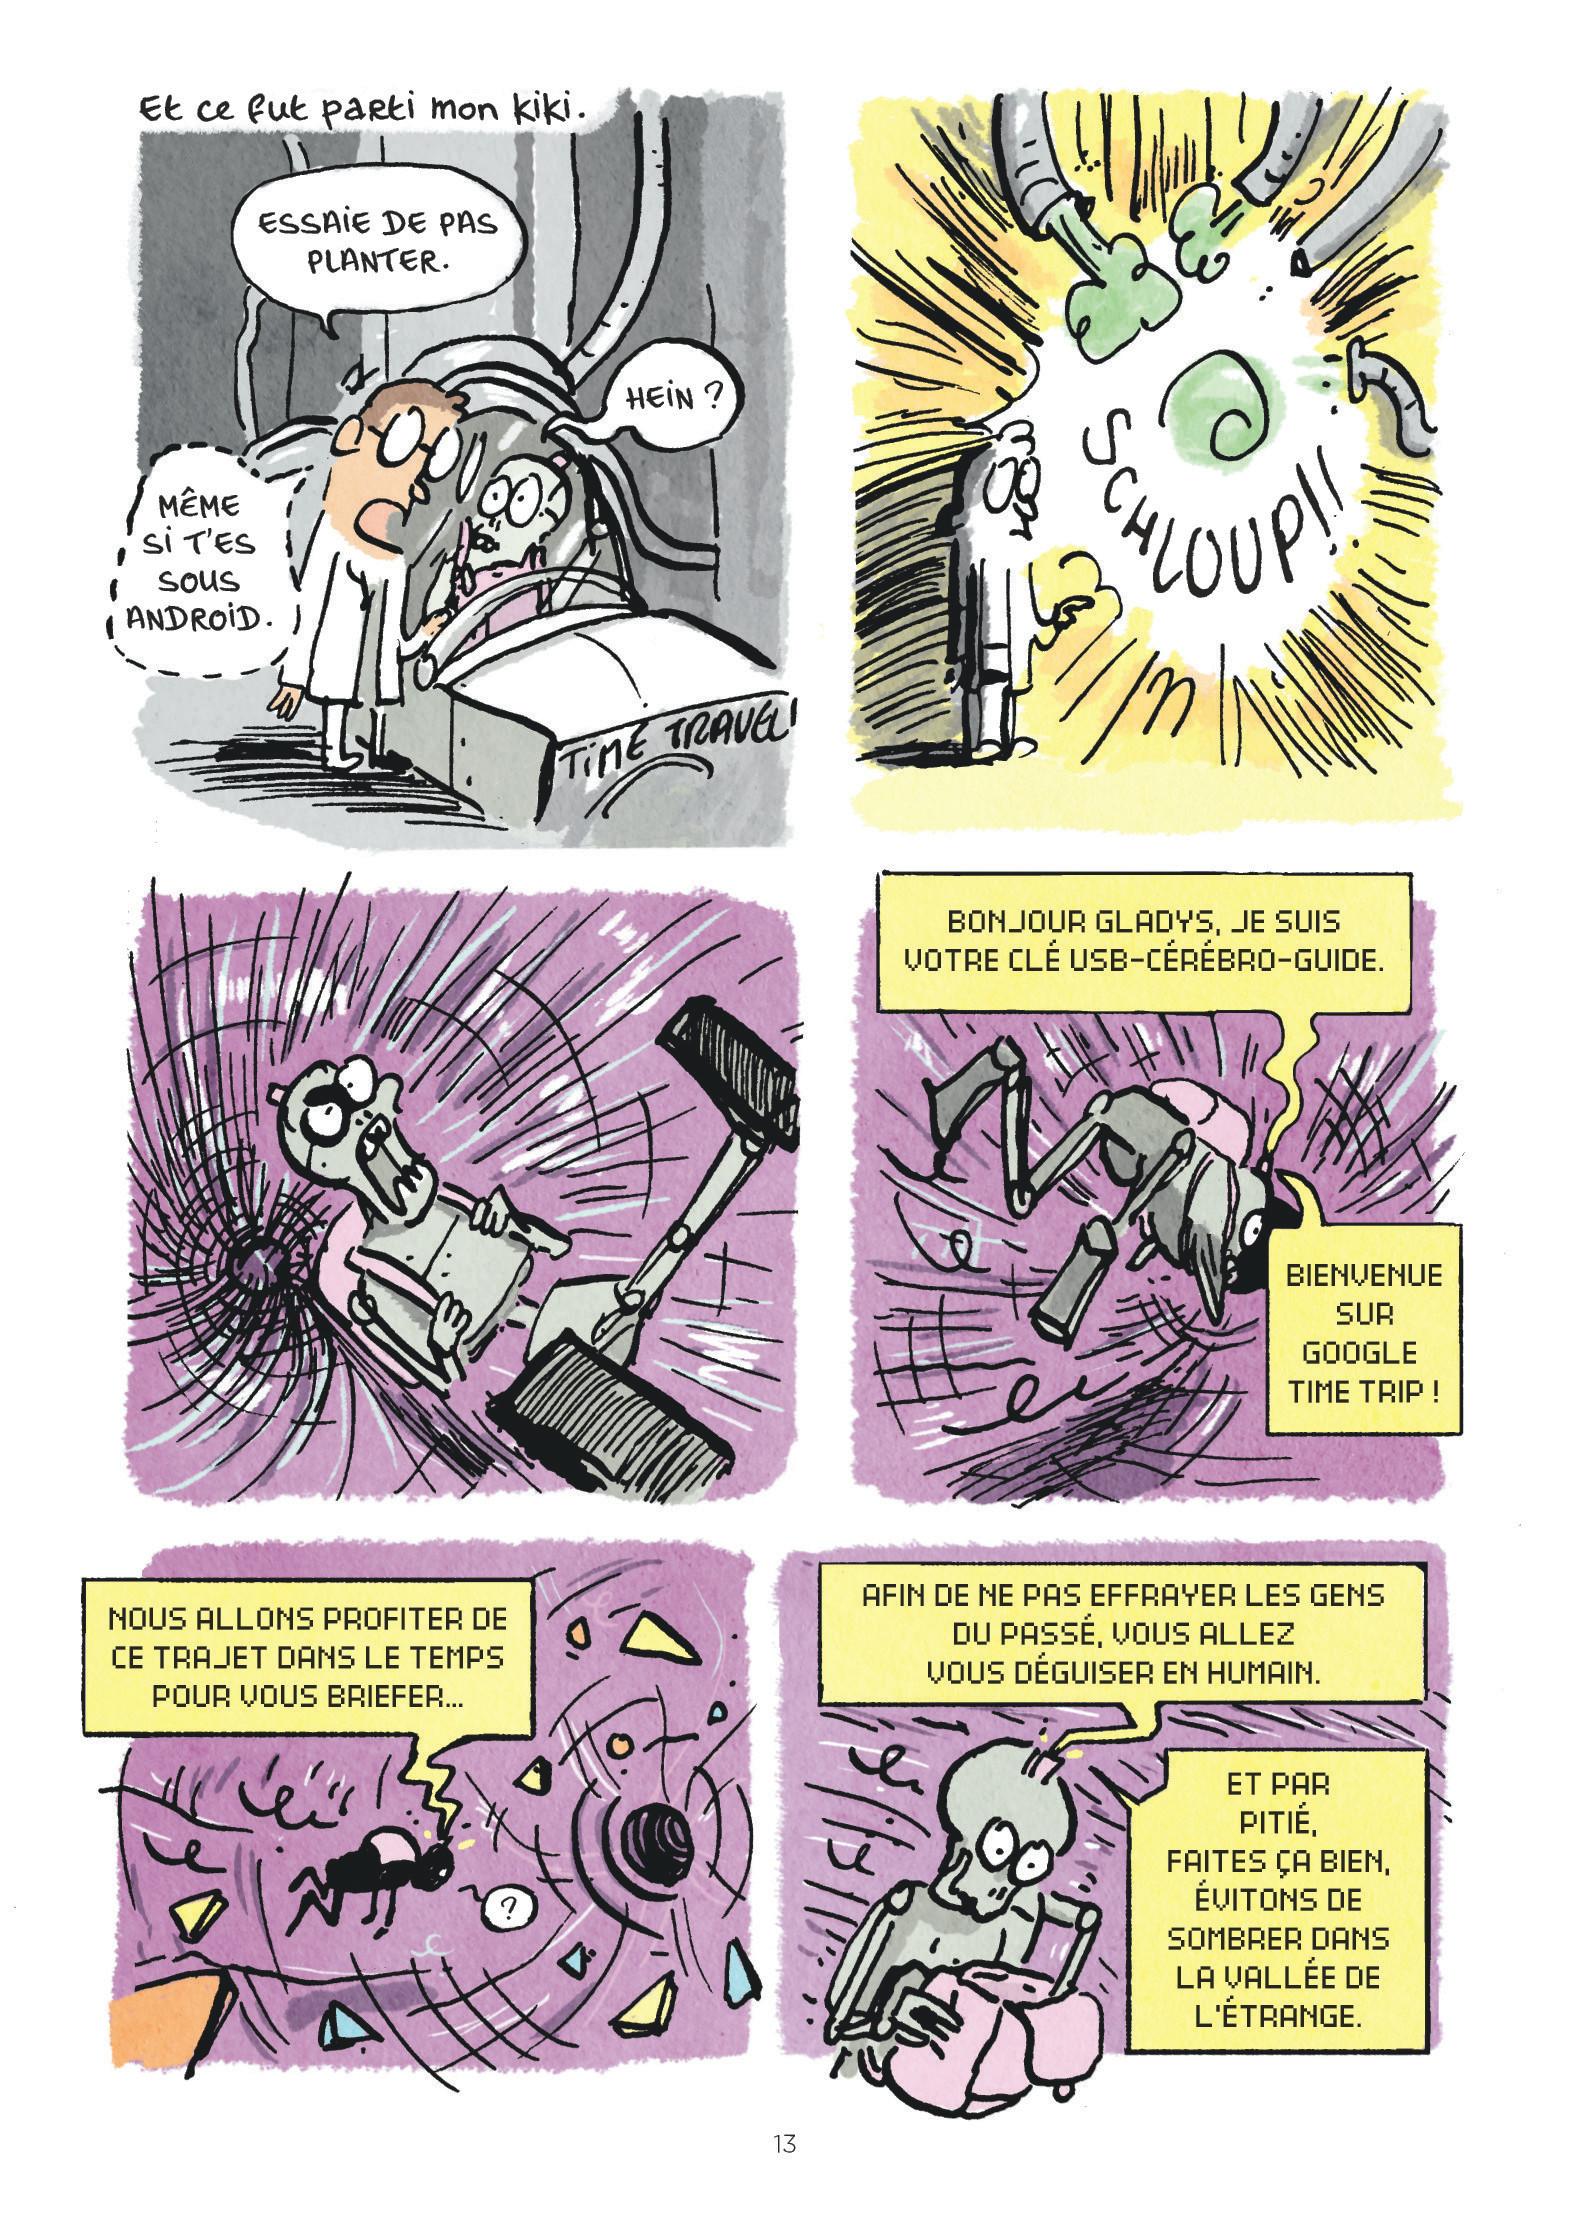 BDTK#1_Page 13